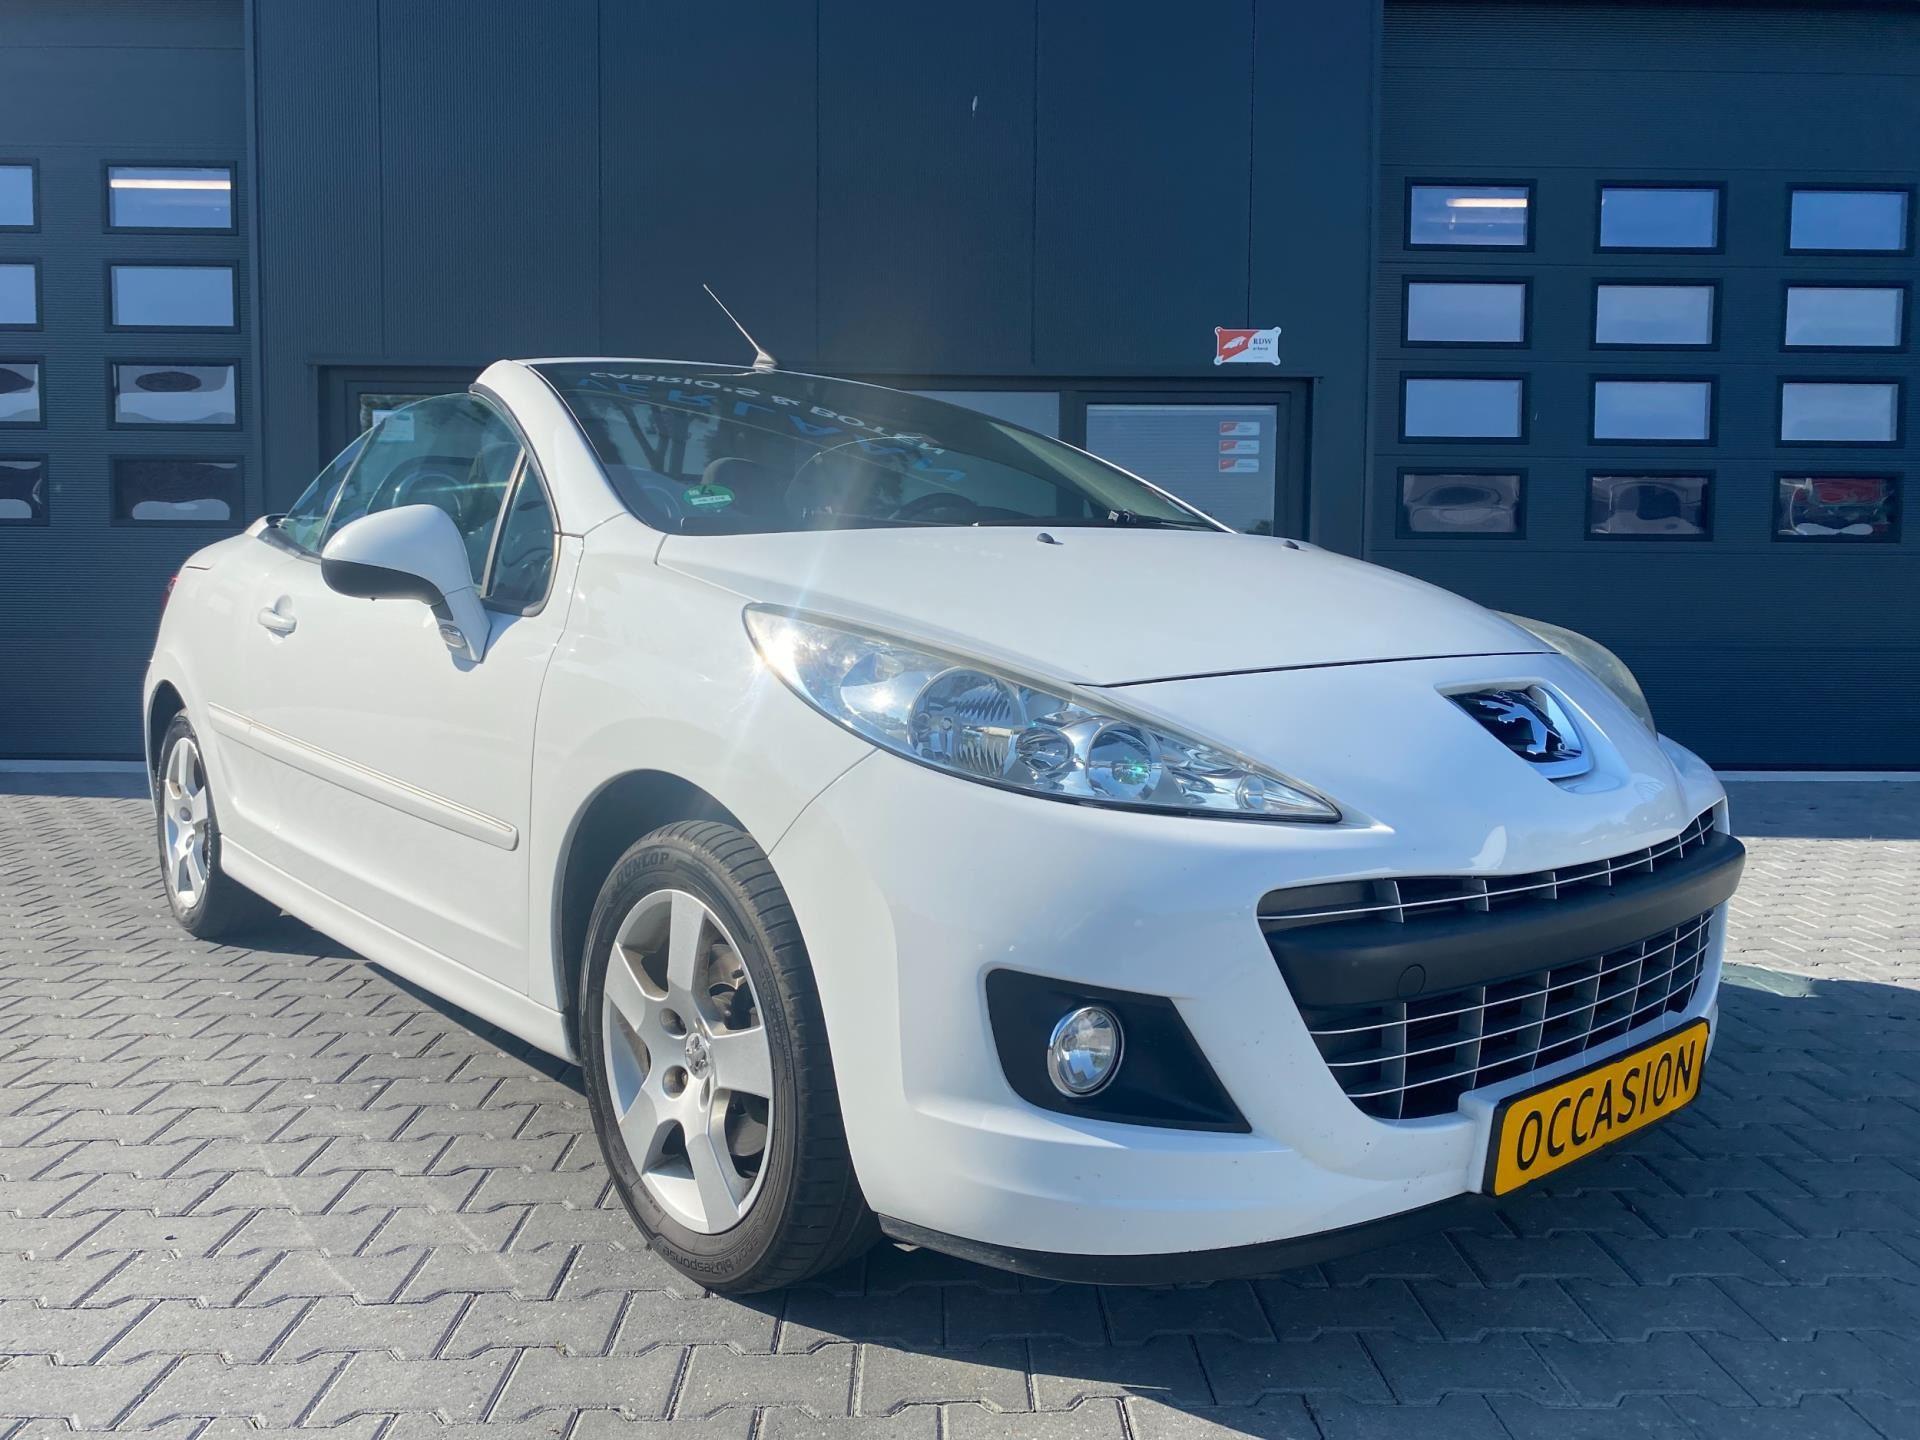 Peugeot 207 CC occasion - Verlaan Cabrio's en Boten